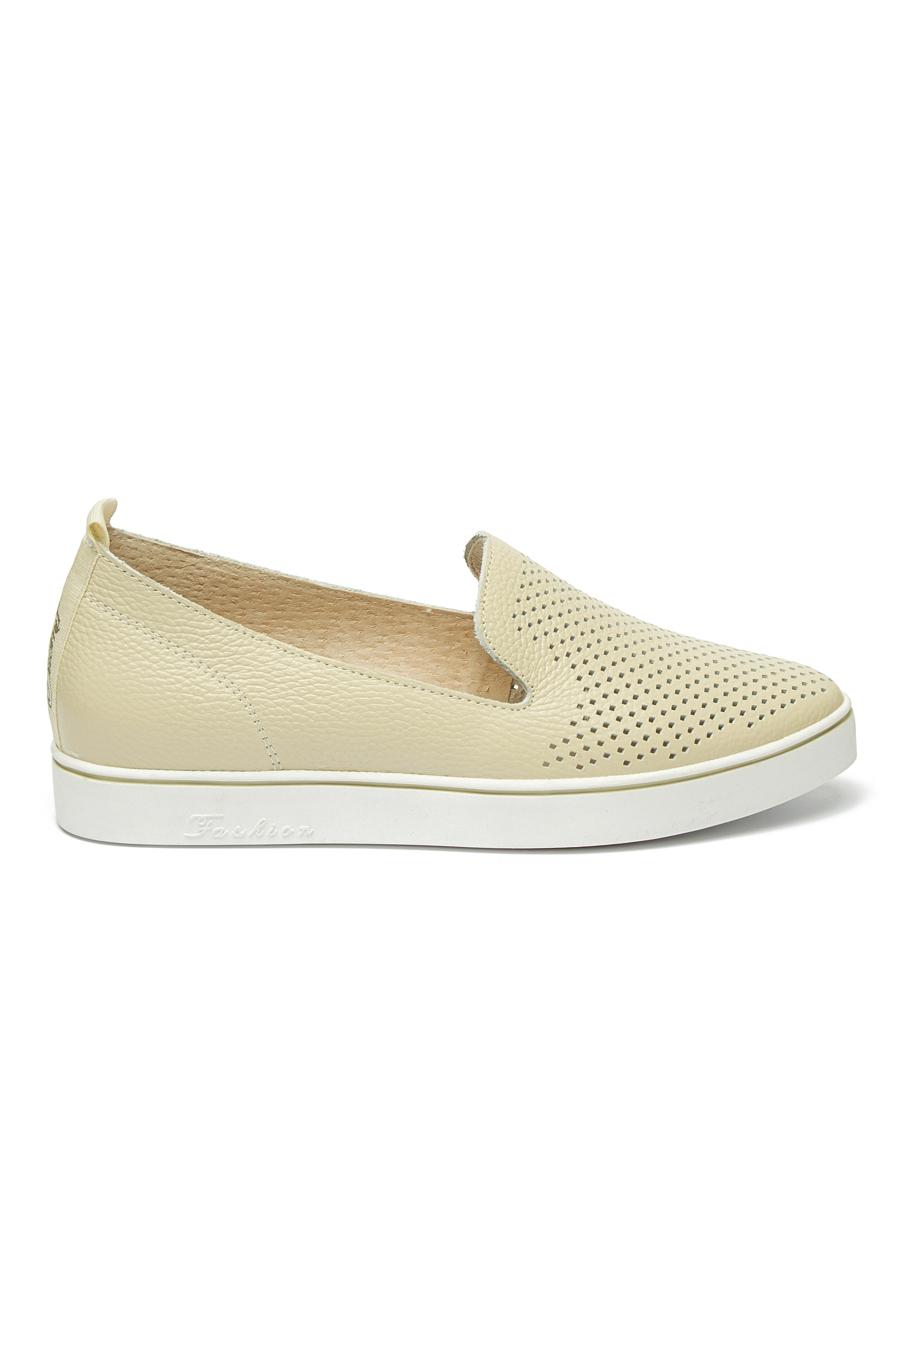 Bézs Női cipők Budmil.hu üzletből GLAMI.hu